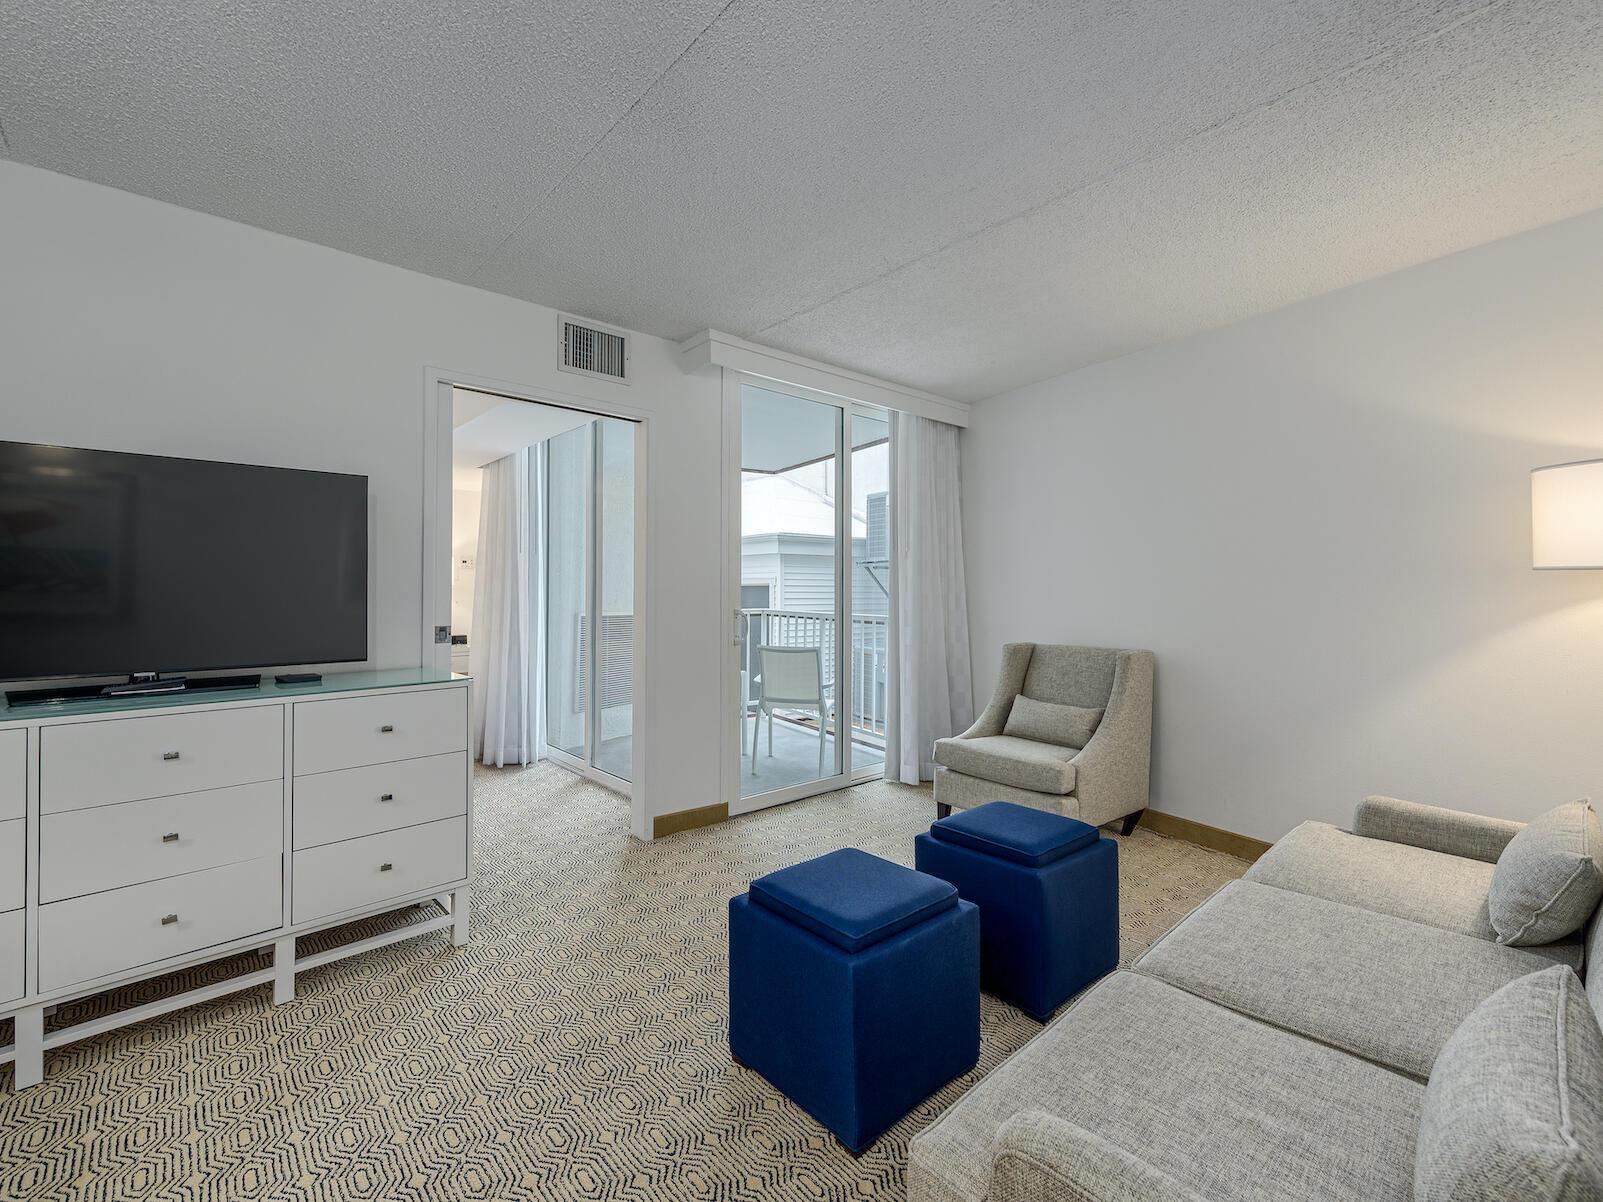 Classic King ADA Suite Handicap Accessible Hotel Room near Wildwood NJ